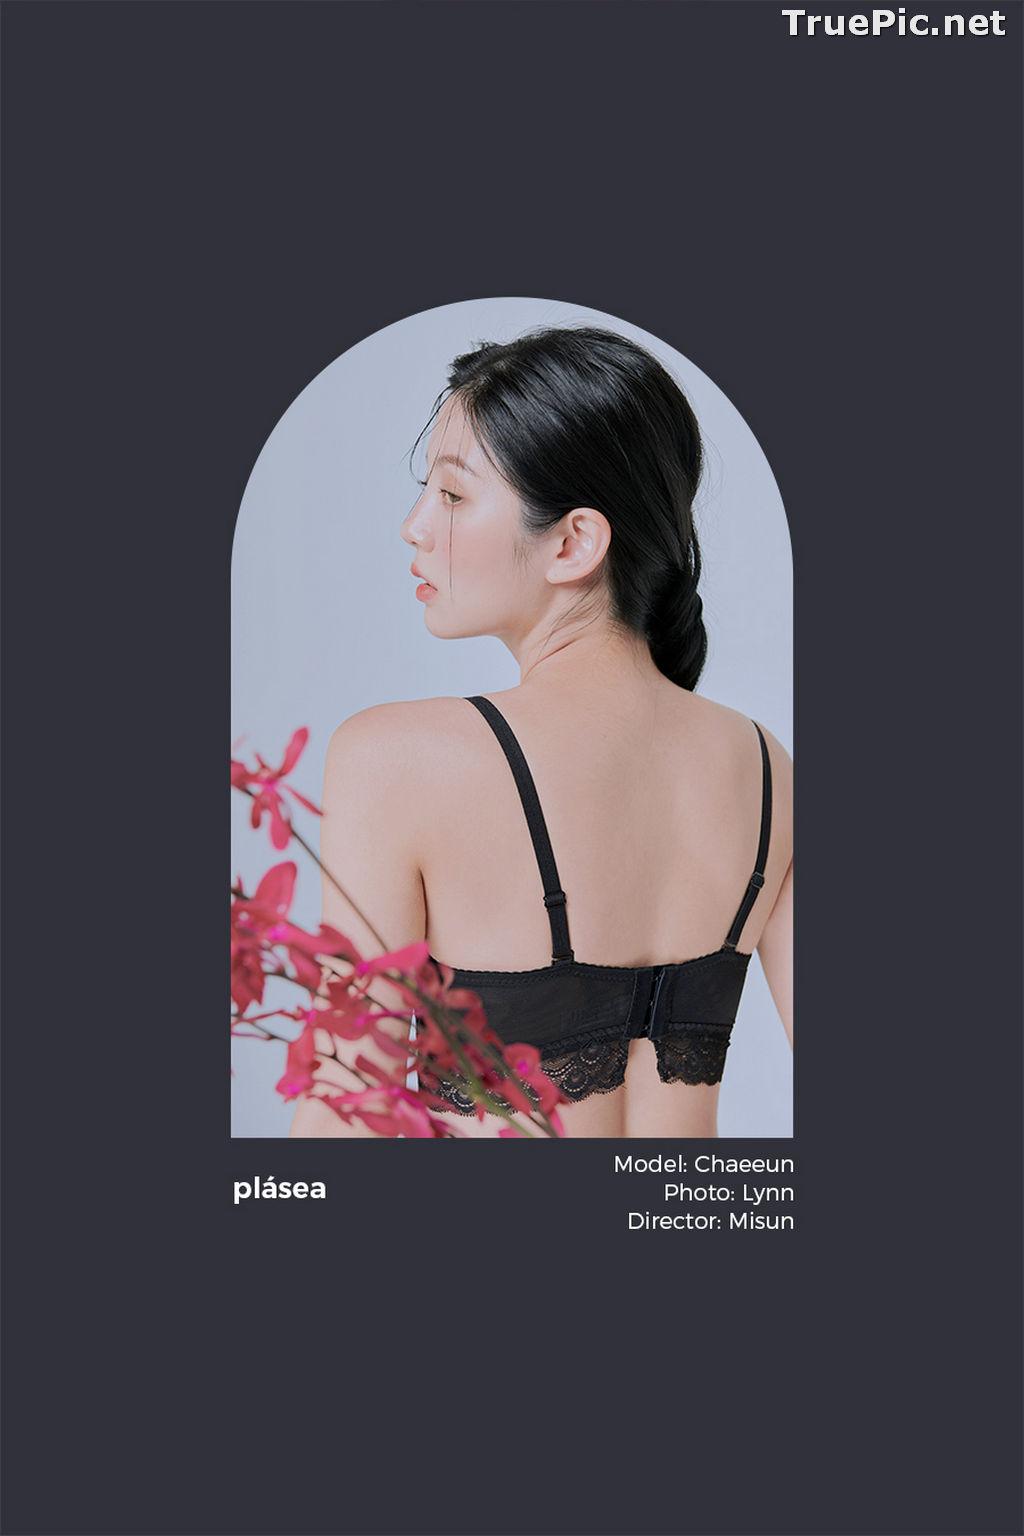 Image Korean Fashion Model – Lee Chae Eun (이채은) – Come On Vincent Lingerie #4 - TruePic.net - Picture-4